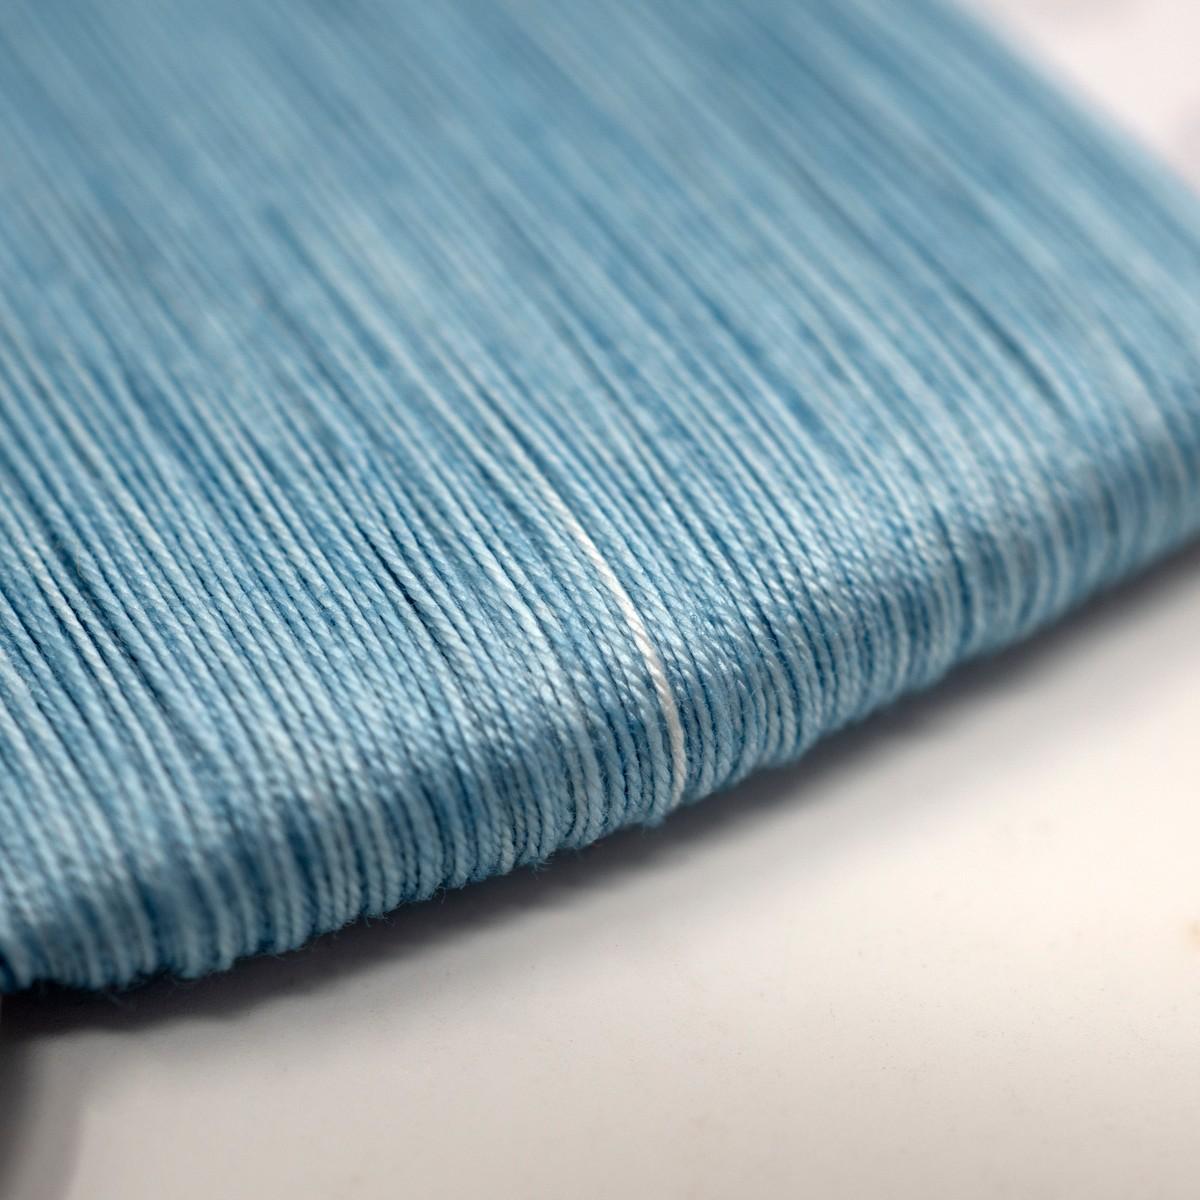 Photo of BUAISOU Sewing Thread: Light Blue Indigo